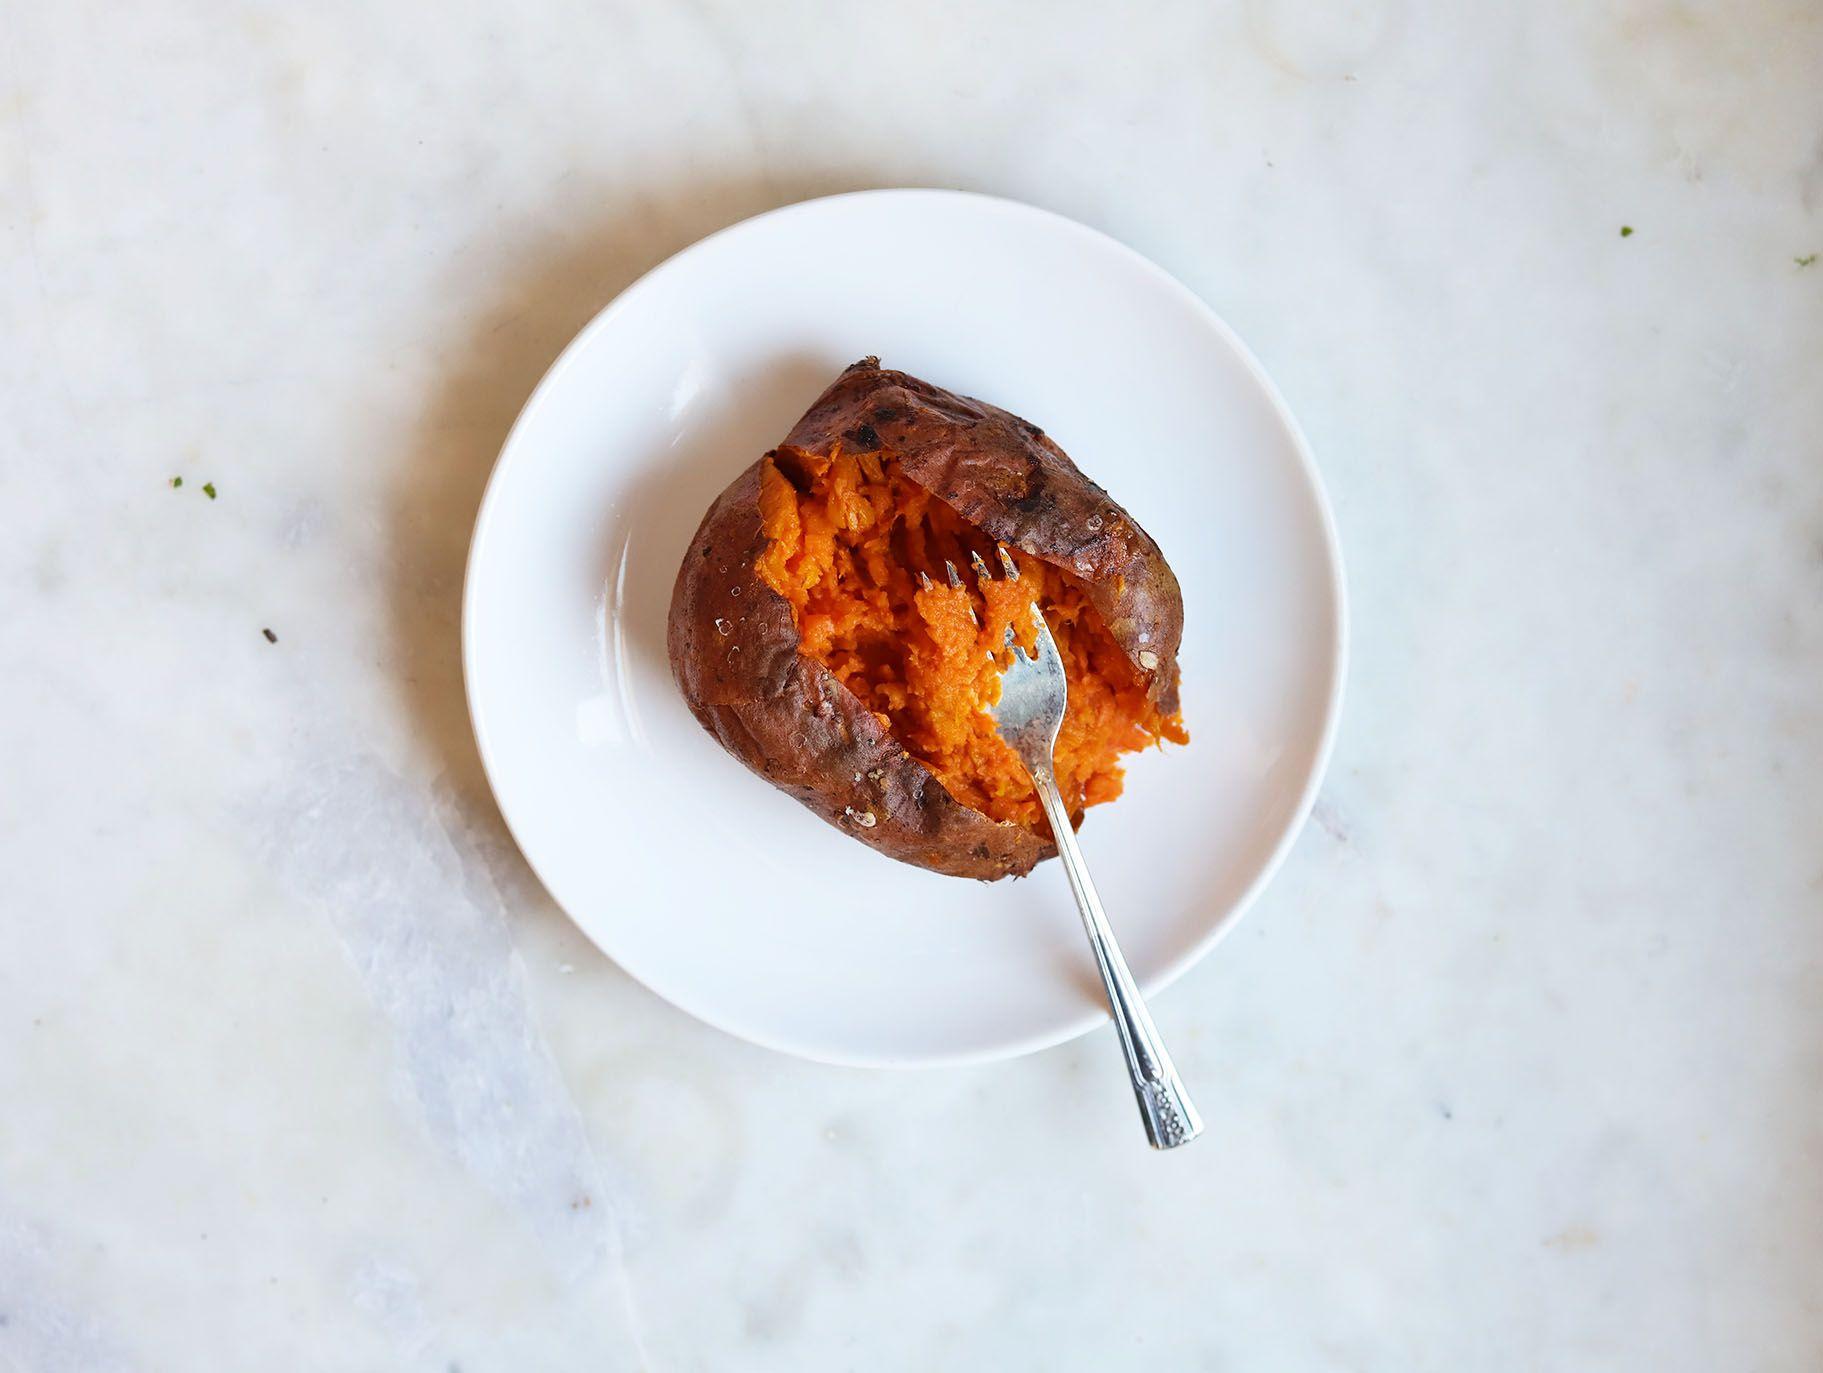 sweet potato cut open and mashed